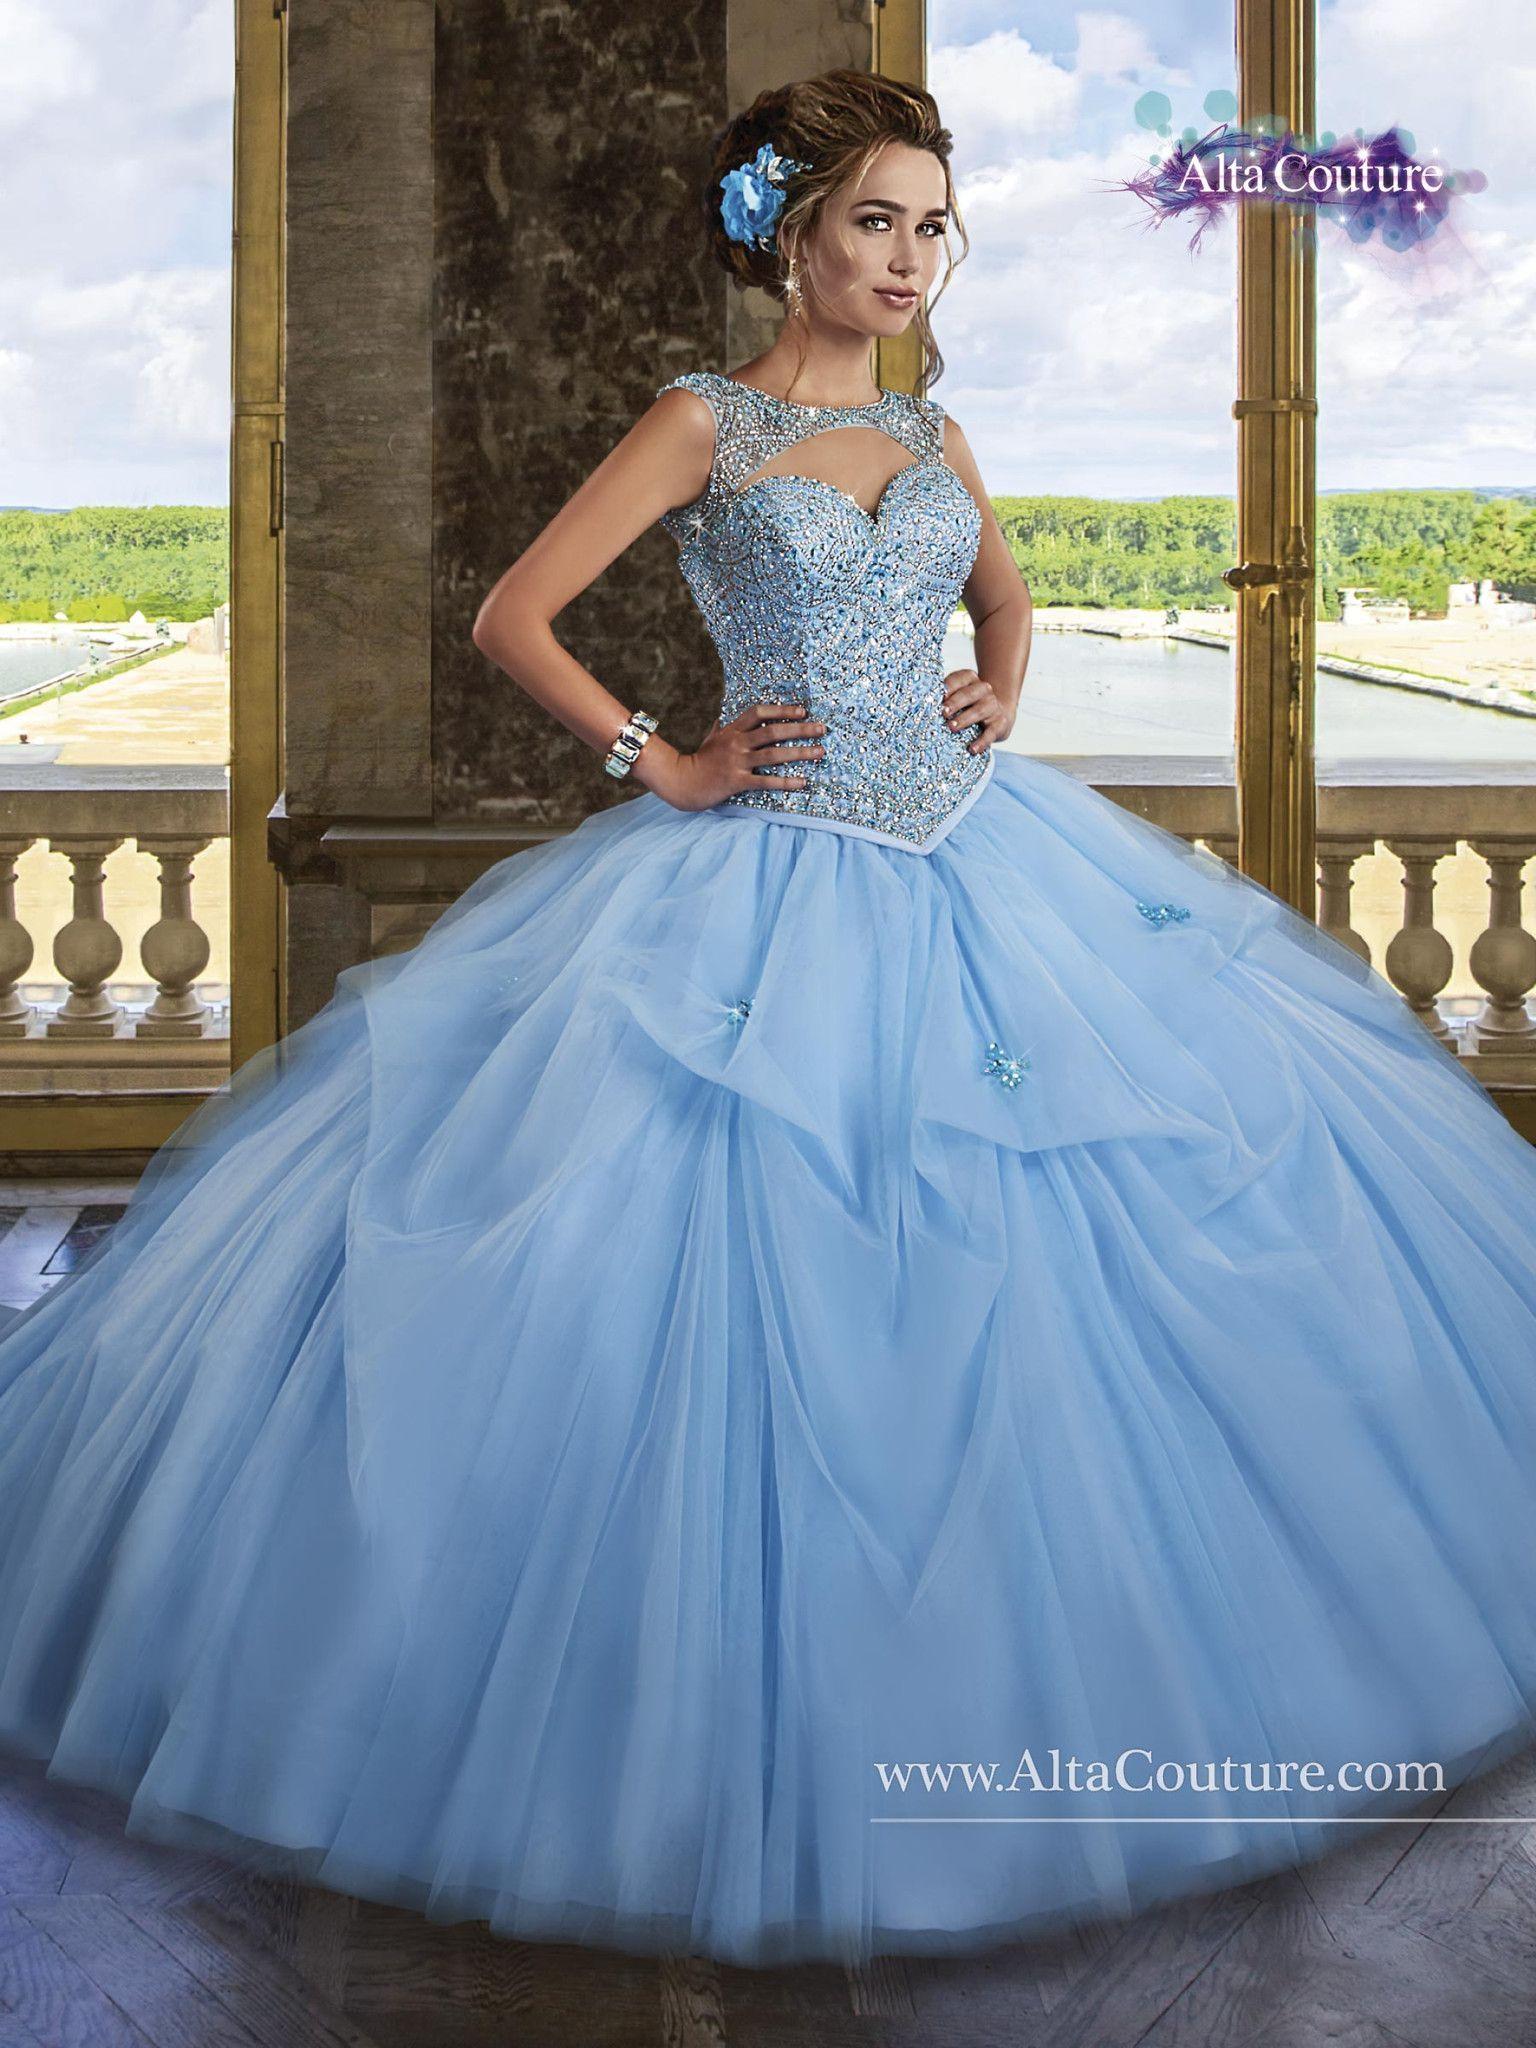 7a1e1426fc6 Alta Couture Quinceanera Dresses - Data Dynamic AG